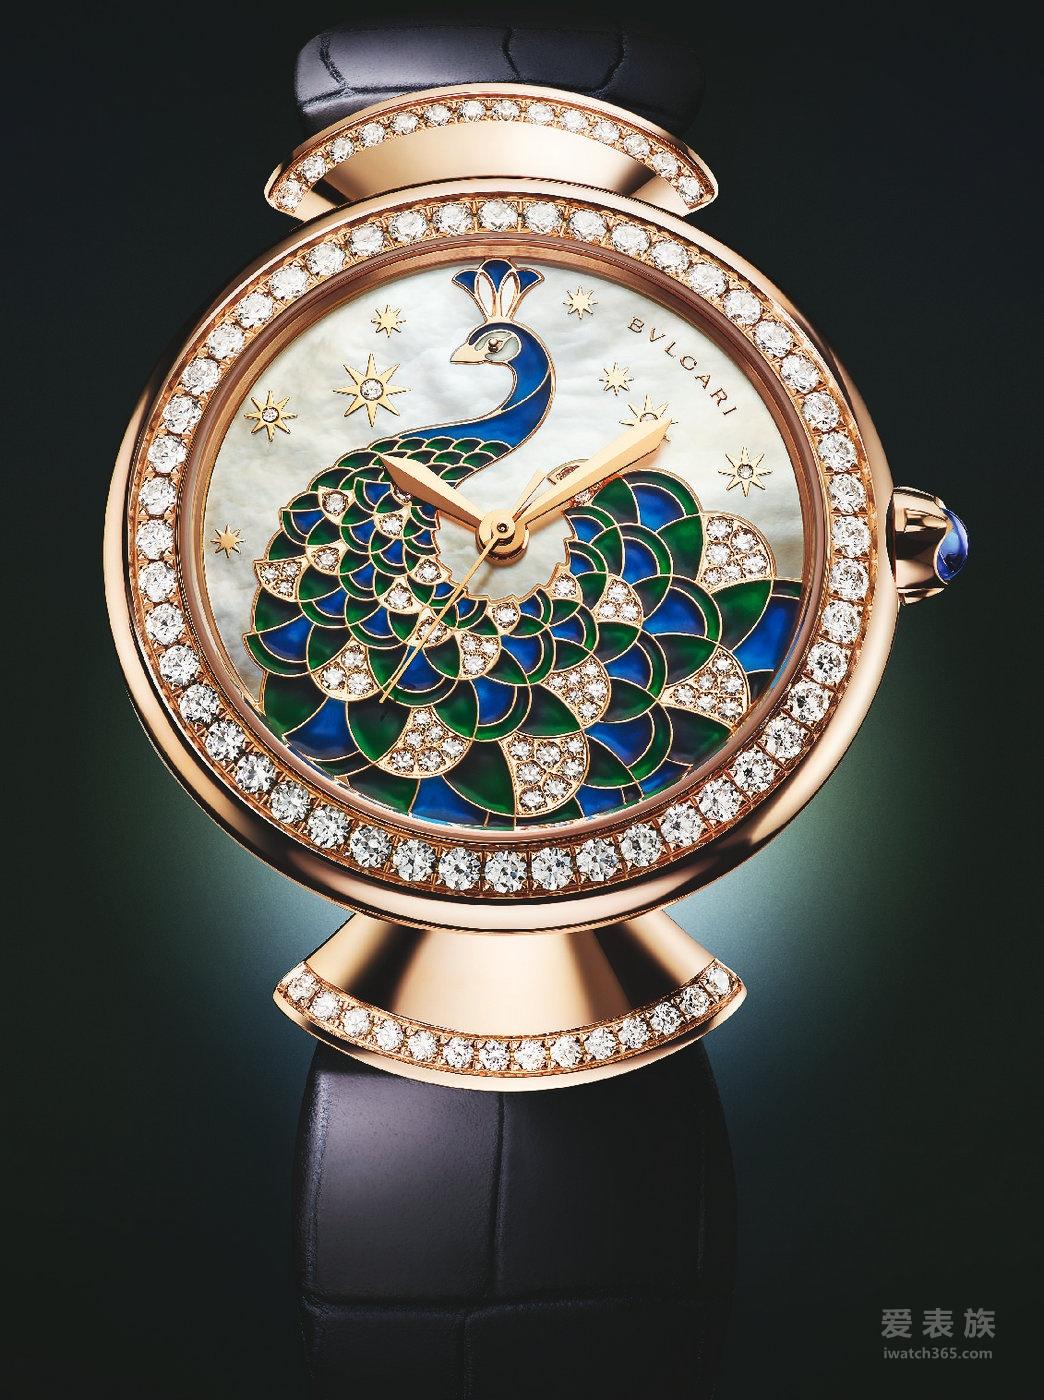 BVLGARI寶格麗DIVAS' DREAM系列腕表